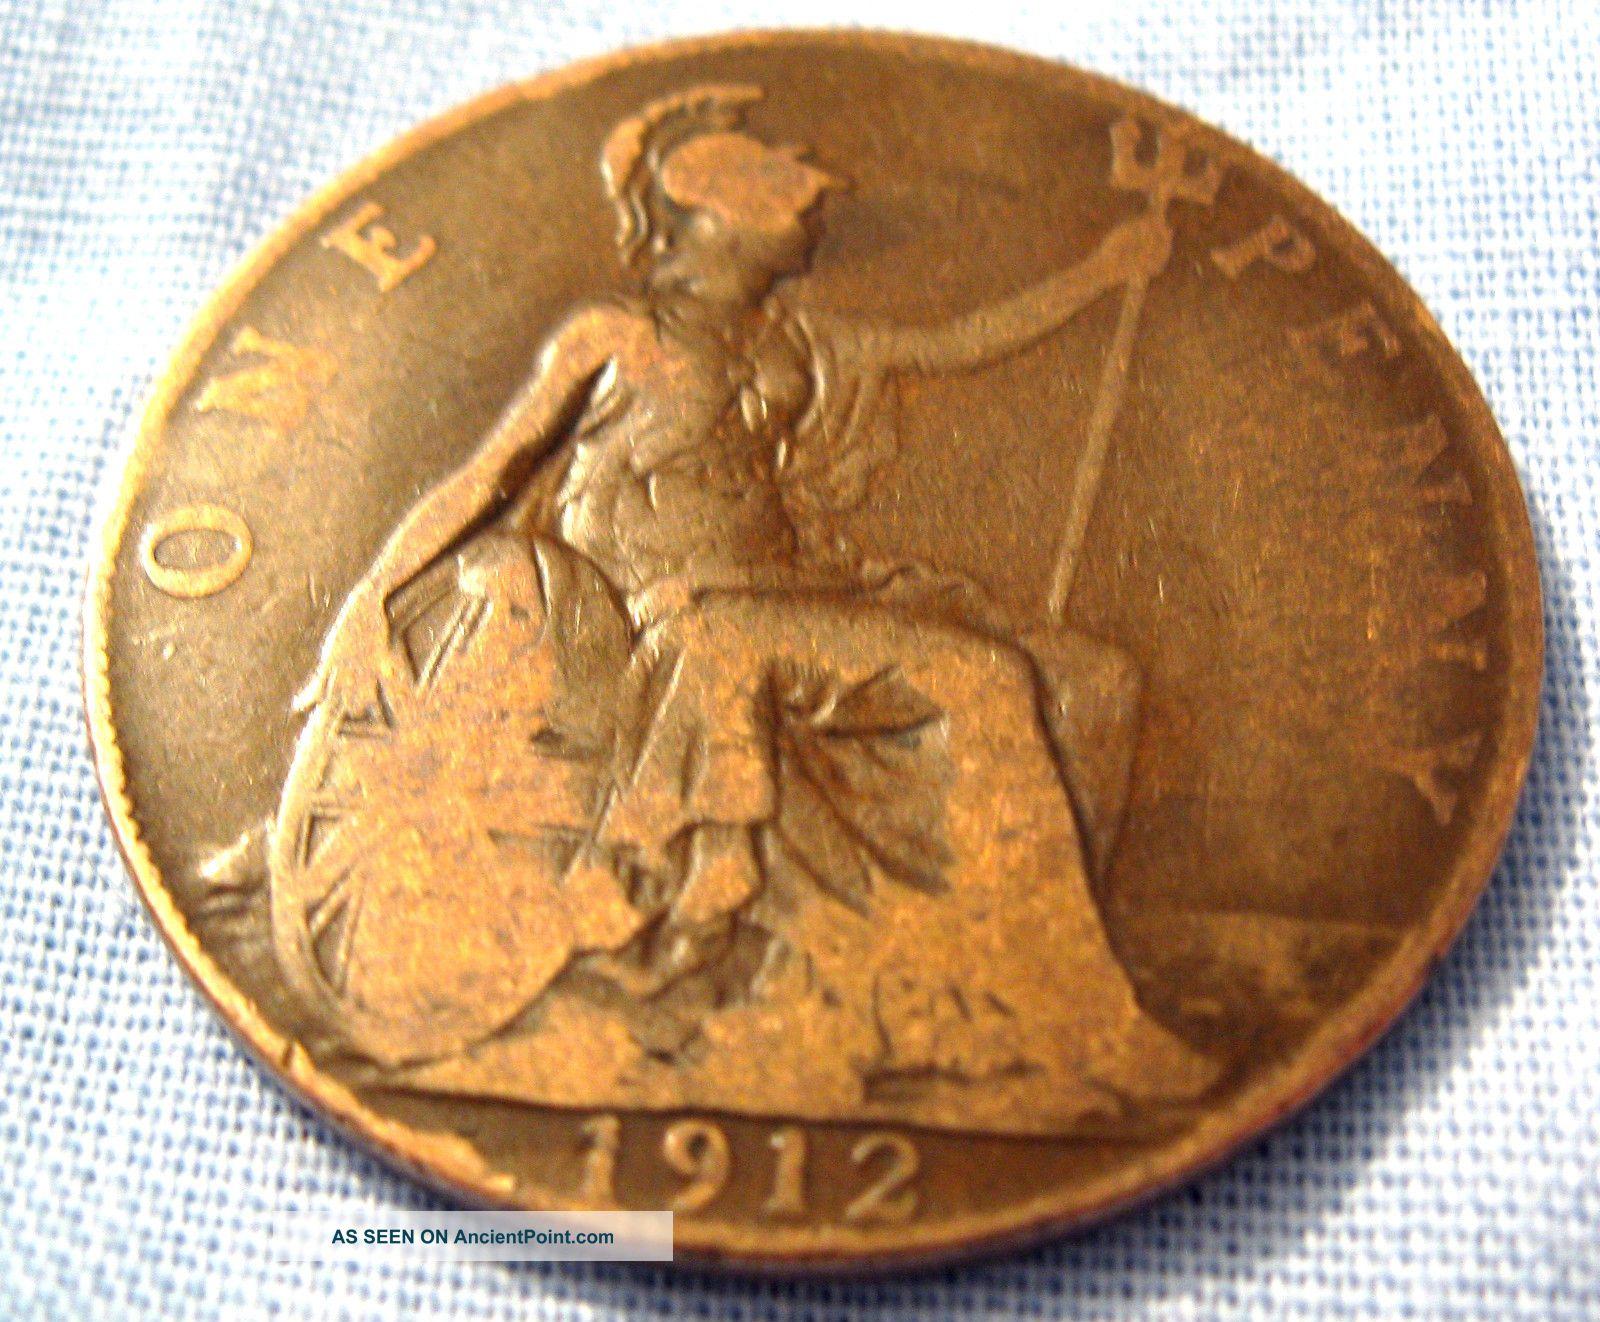 ... Titanic Coin Ship Cruise Vintage Old Retro Antique Uncategorized photo